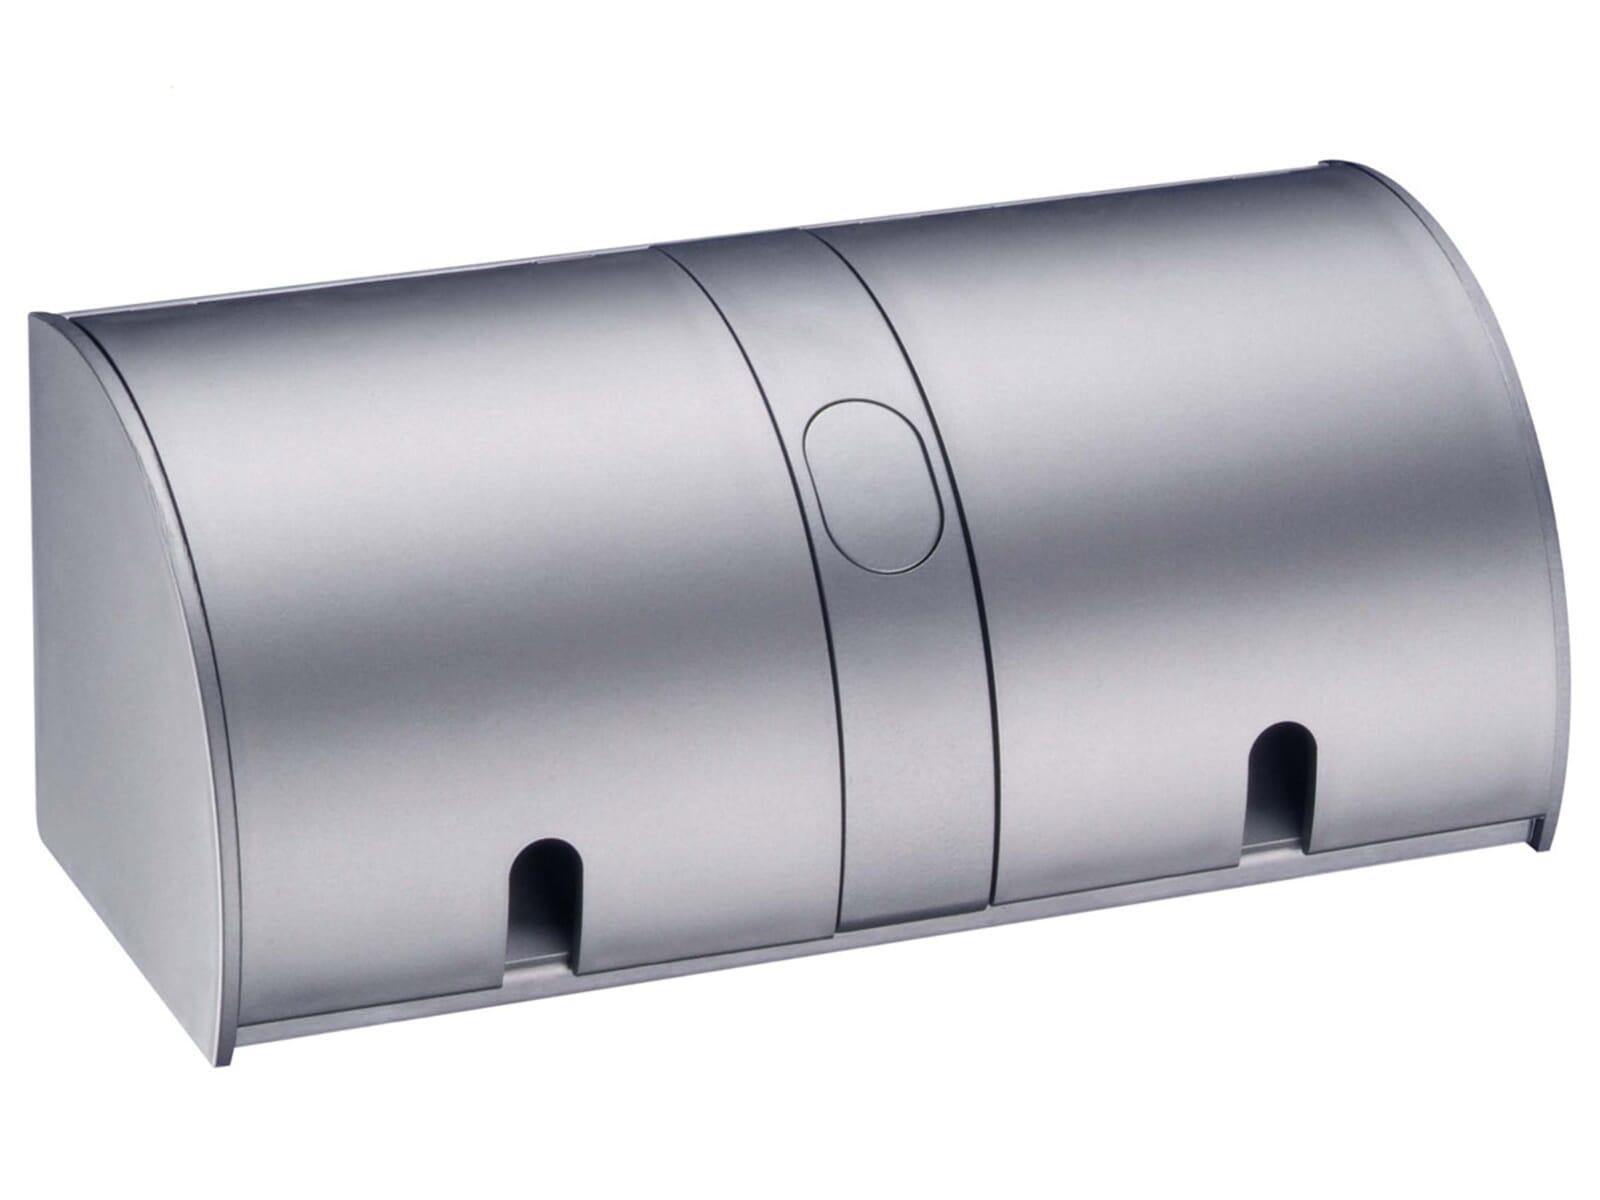 Thebo E 1000/STS 2 - 19107 STS 2 Steckdosenelement Aluminium